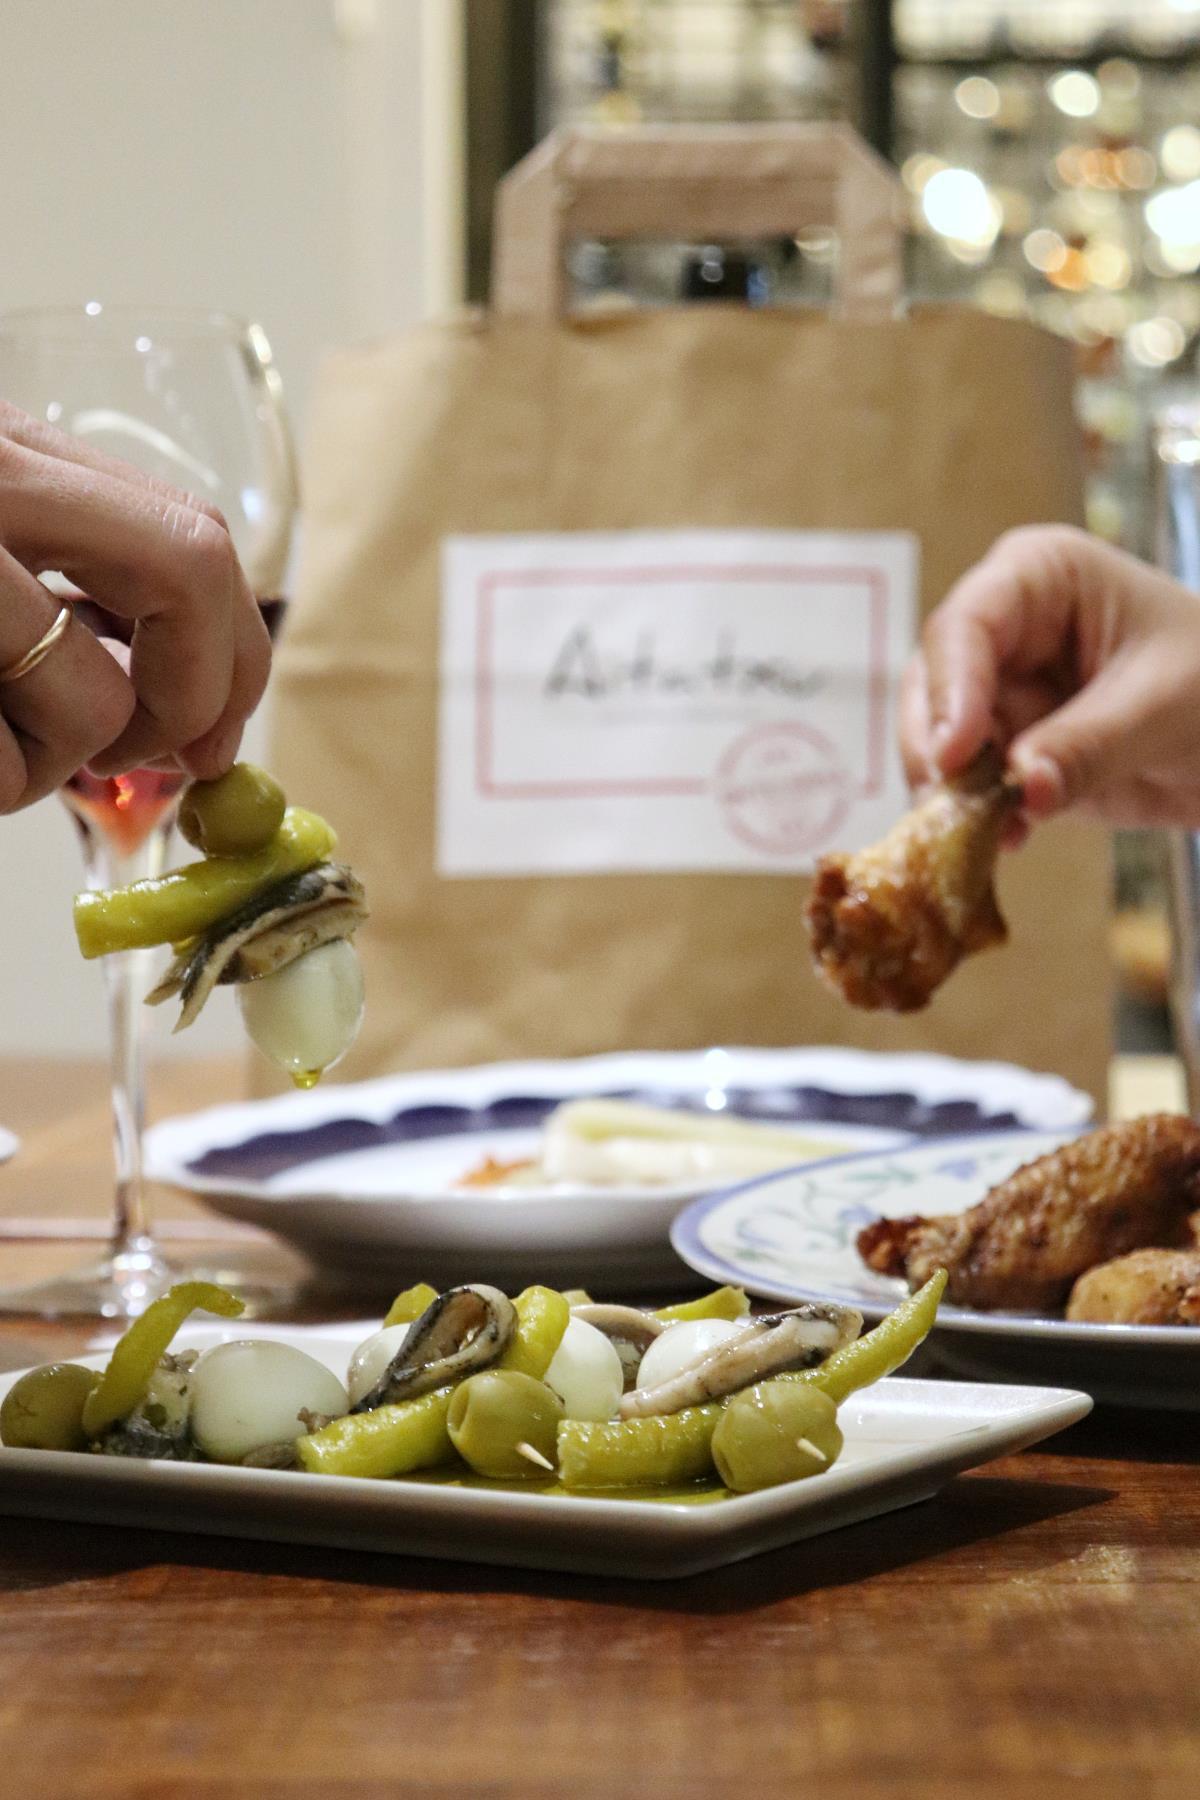 AITATXU EN TU MESA  los mejores restaurantes donde pedir comida en casa - aitatxu en tu mesa 6 3323053c 1200x1800